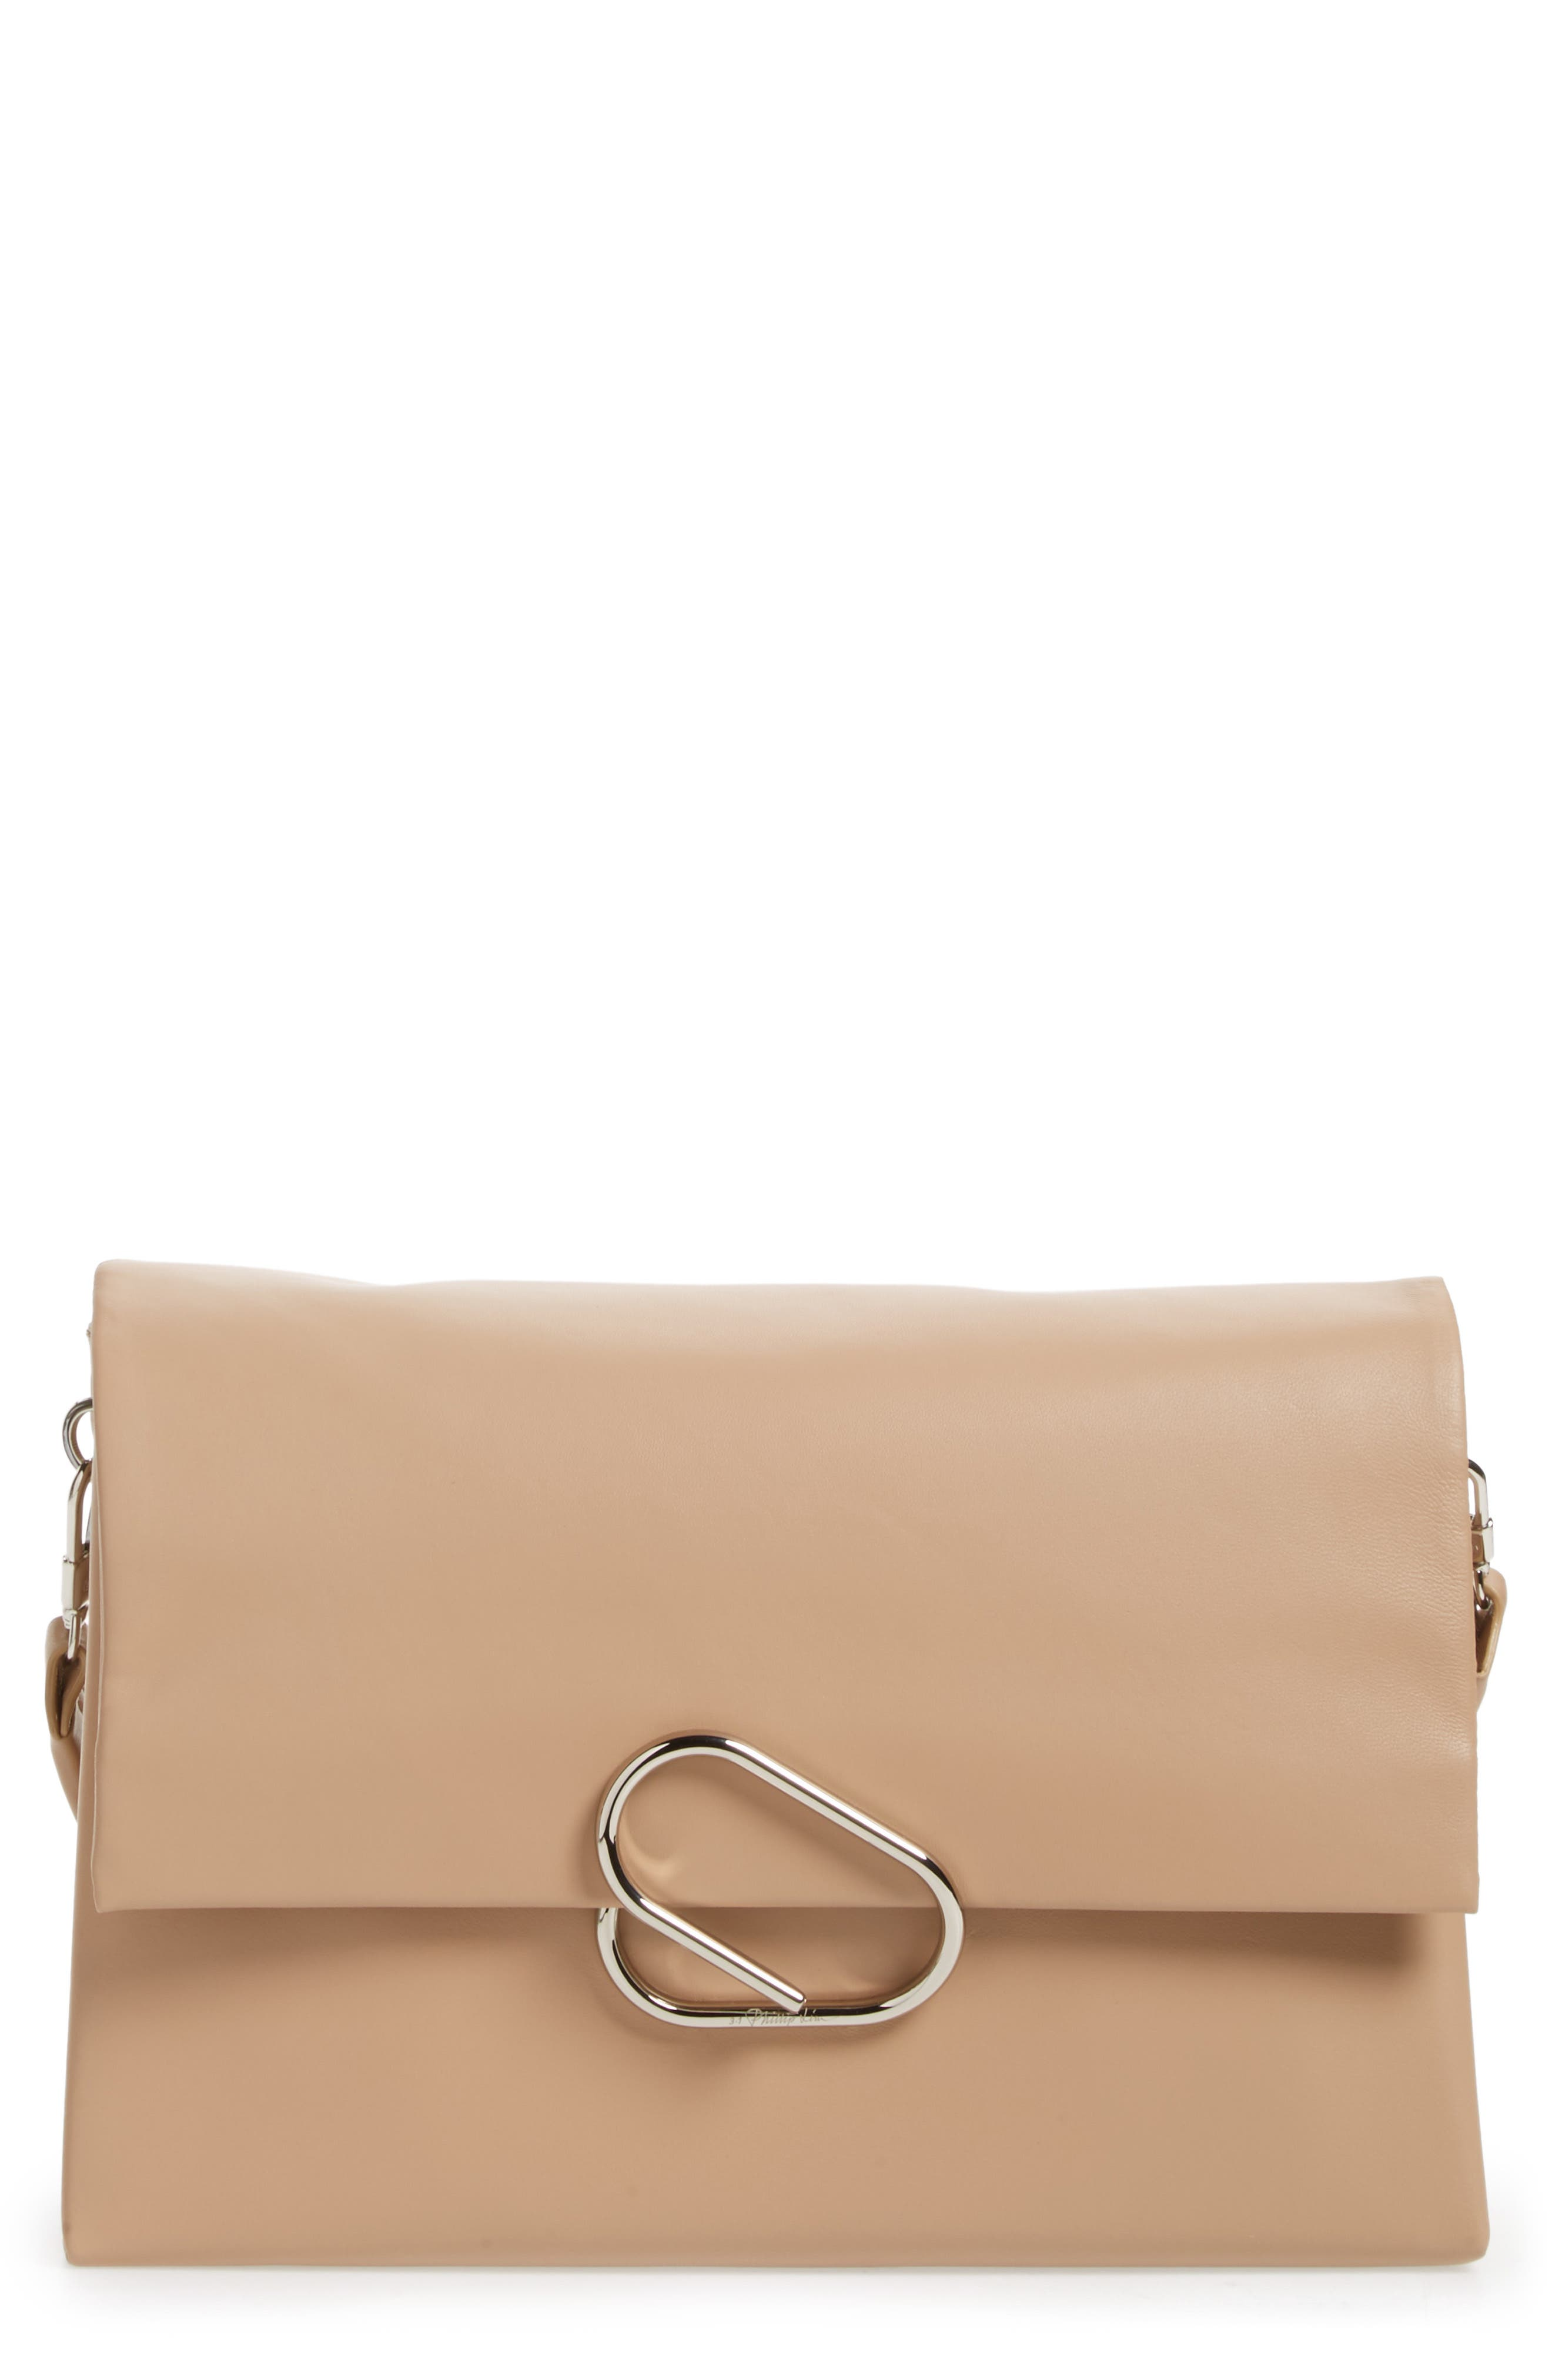 Oversized Alix Flap Leather Shoulder Bag,                             Main thumbnail 1, color,                             260